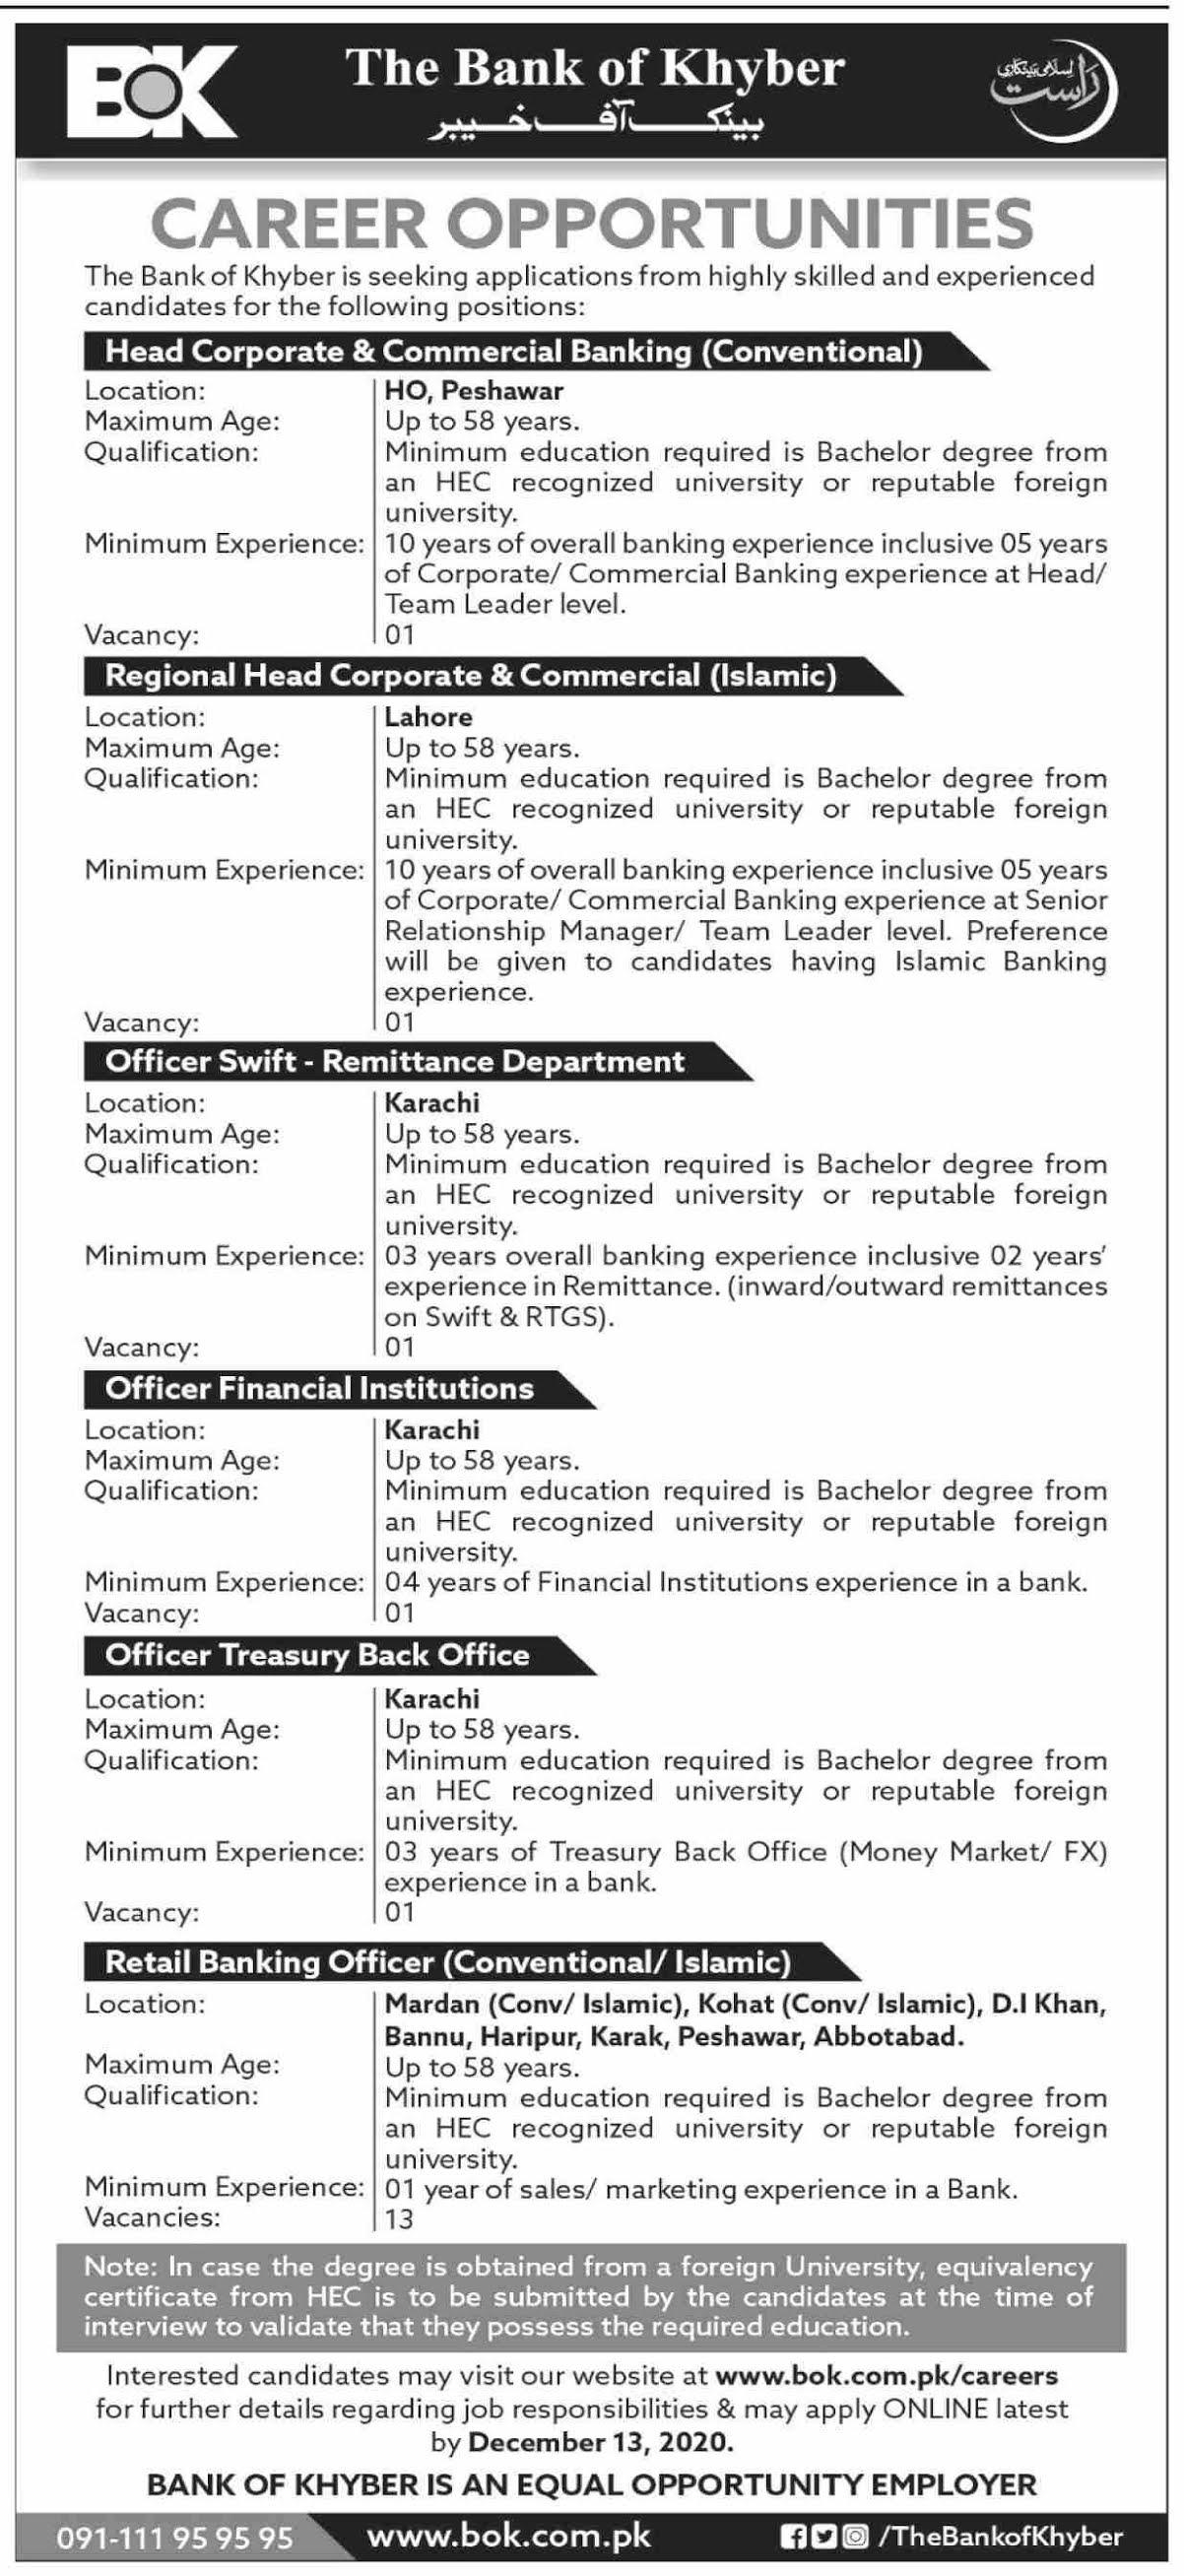 👉 #Jobs - #Career_Opportunities - at bank of khyber ltd  #Jobs Laste date 13December 2020